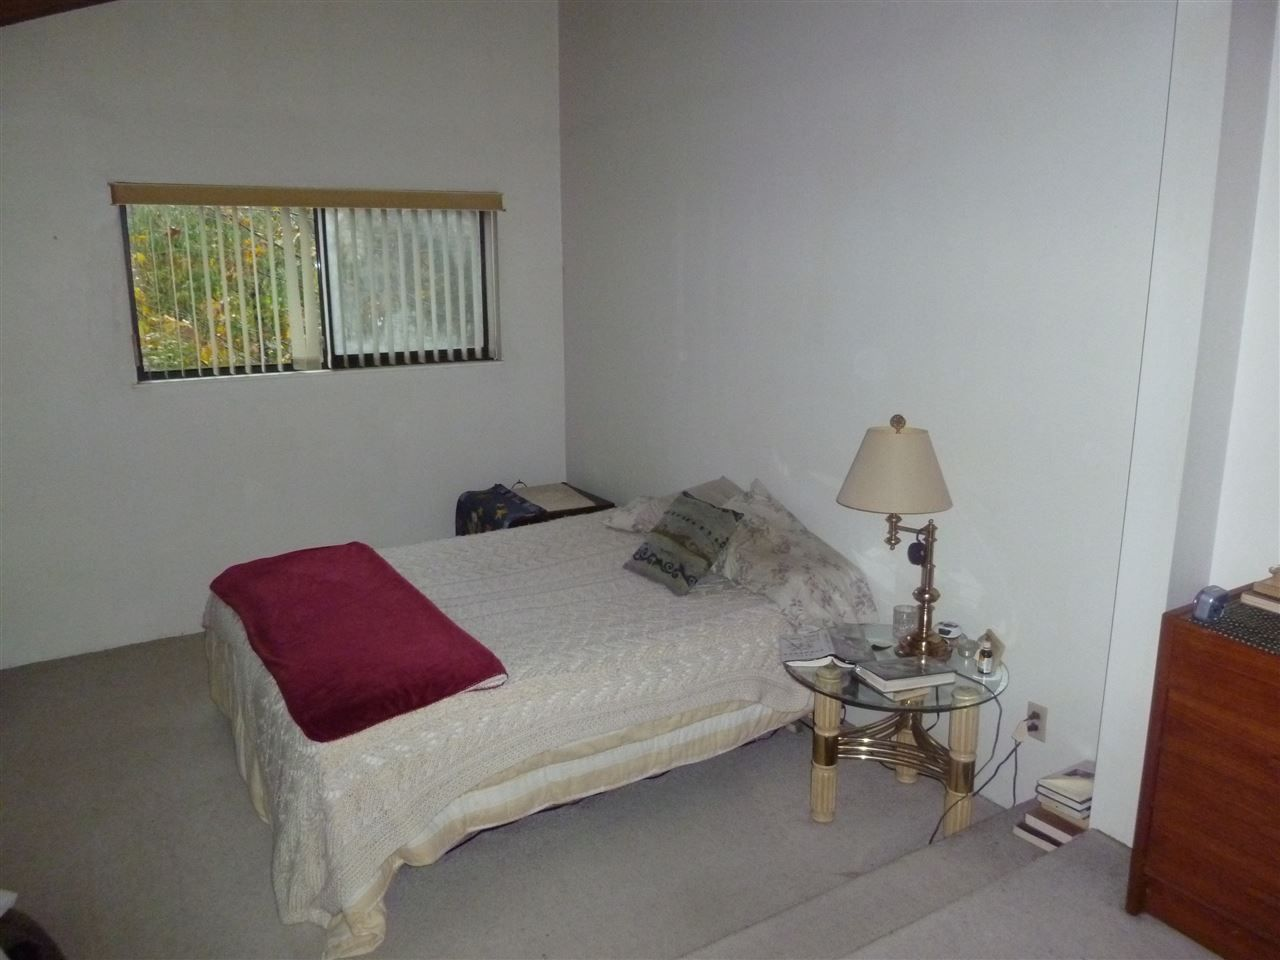 Photo 4: Photos: 5912 DEERHORN Drive in Sechelt: Sechelt District House for sale (Sunshine Coast)  : MLS®# R2118567